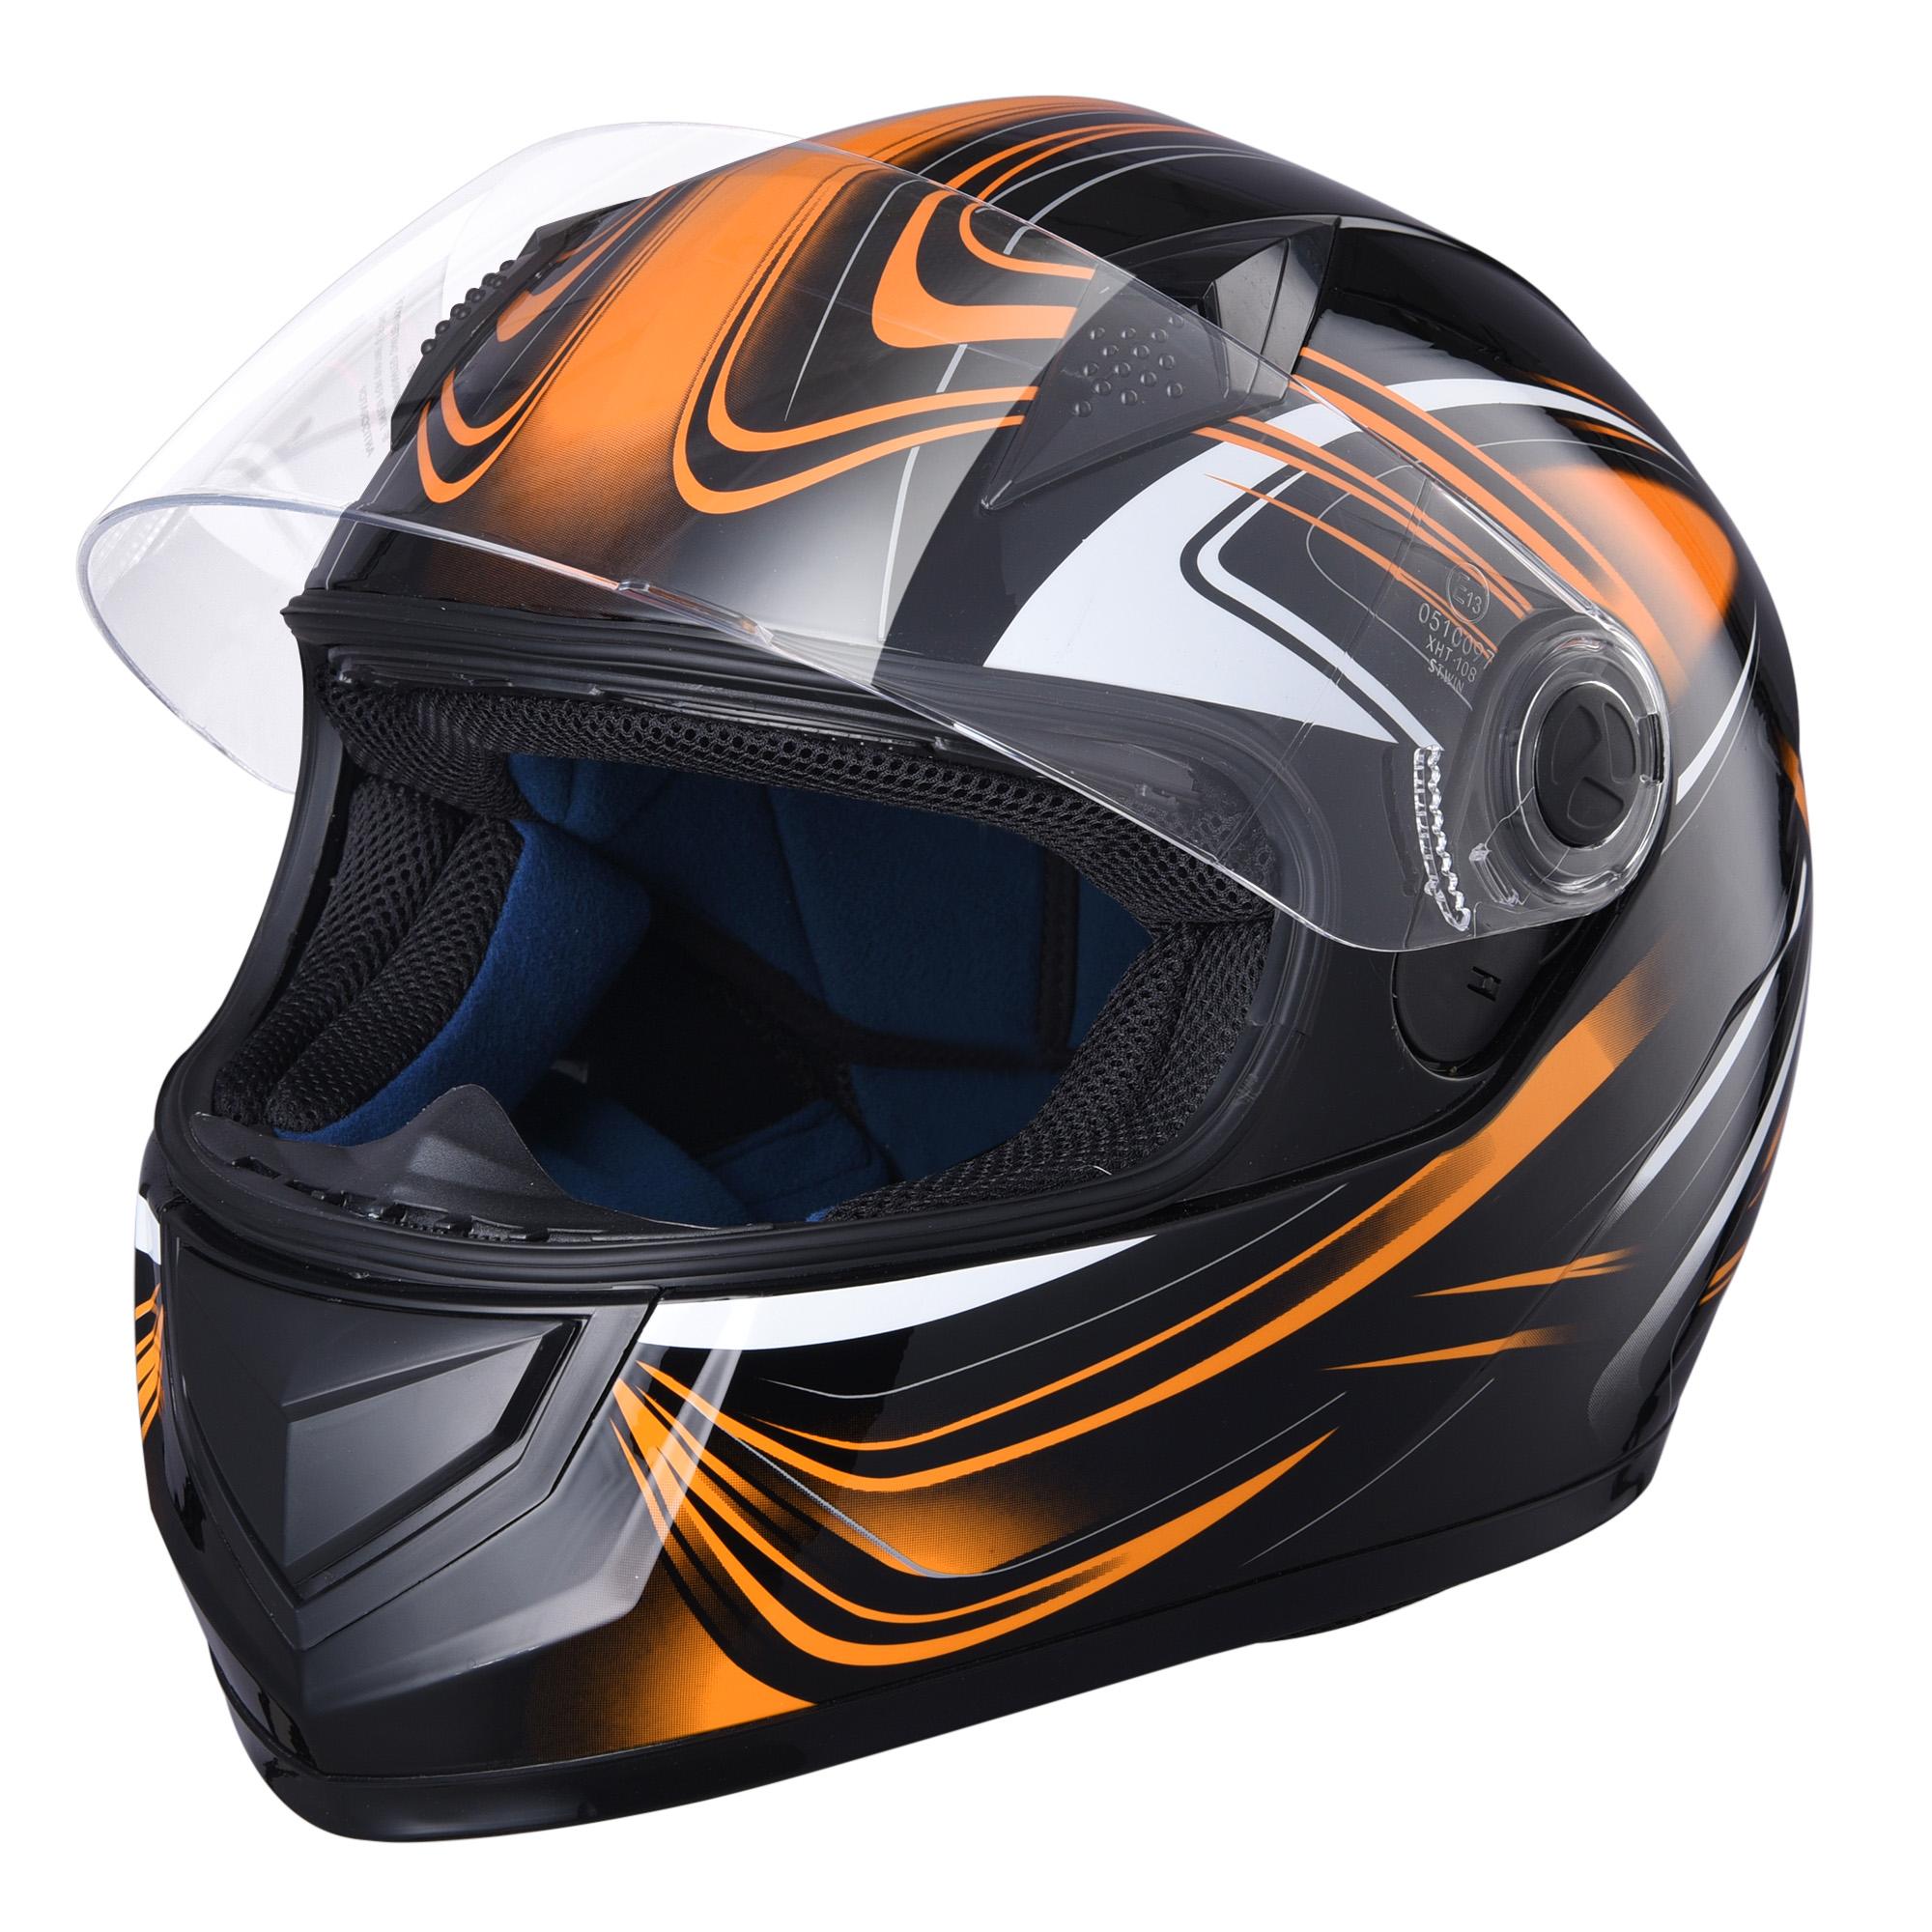 miniature 145 - AHR K12 Full Face Motorcycle Helmet DOT Air Vents Clear Visor Racing S M L XL